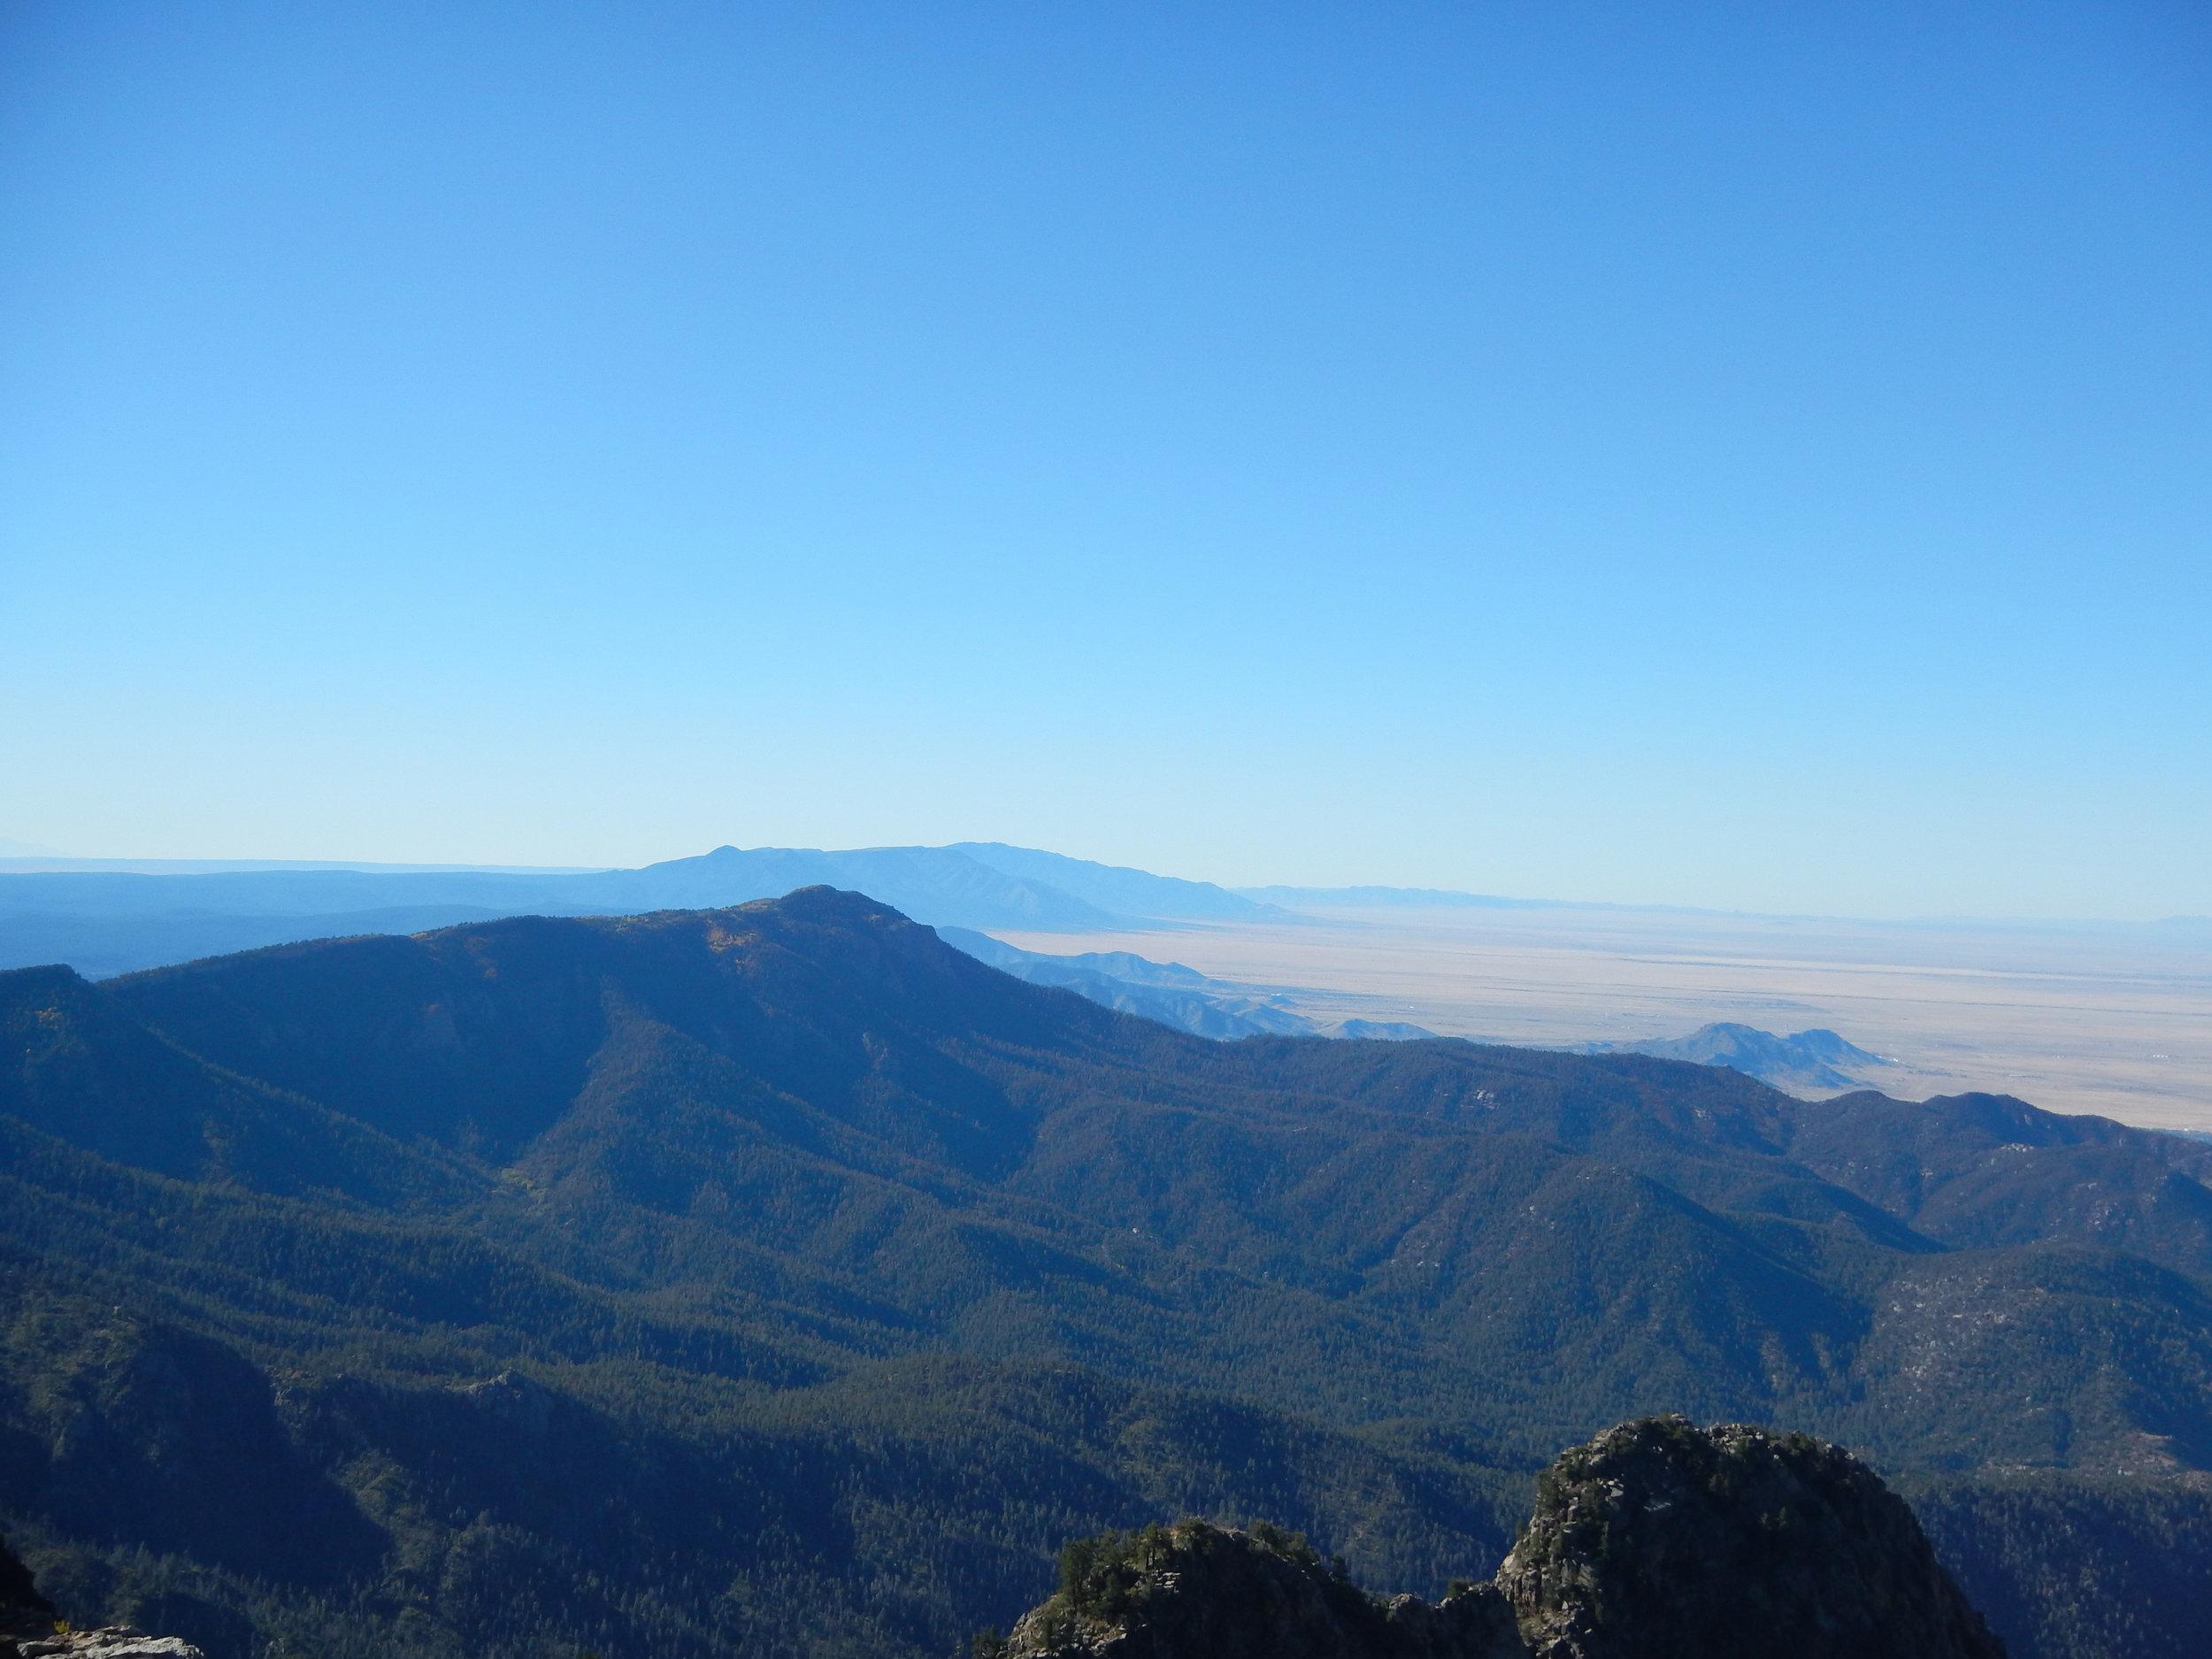 ABQ_Sandia Mountains_Peak.jpg